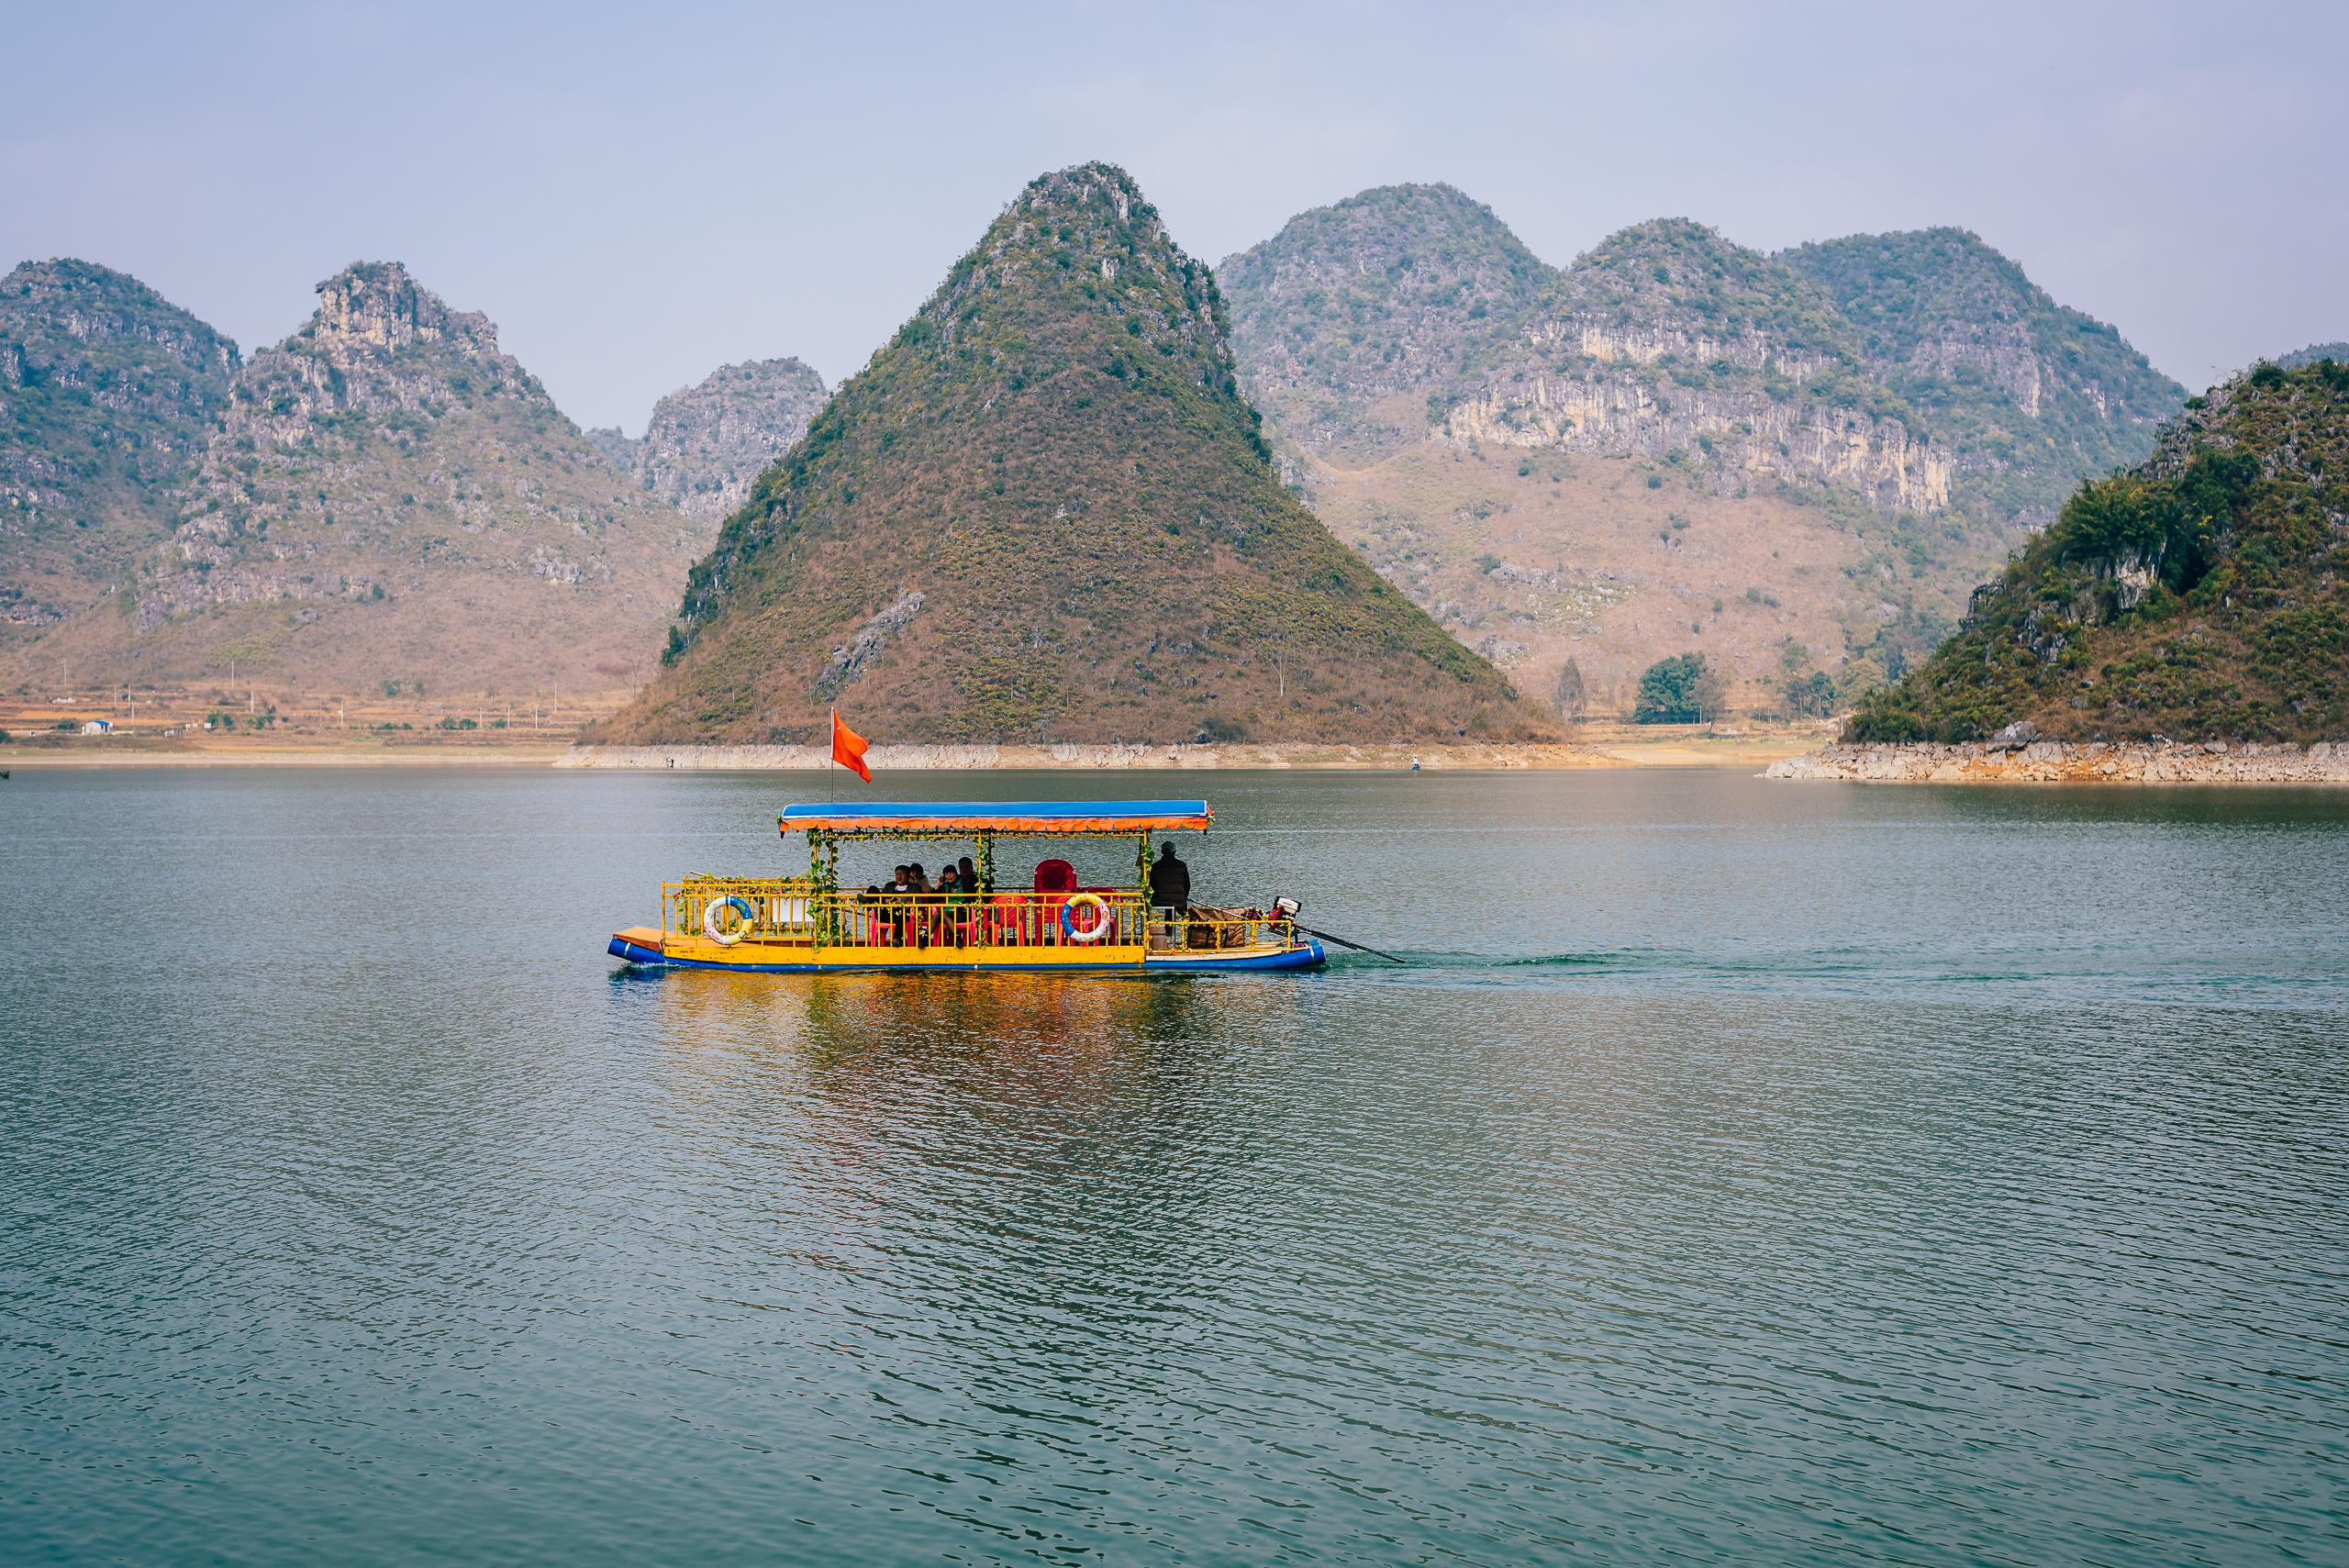 Quyang Lake